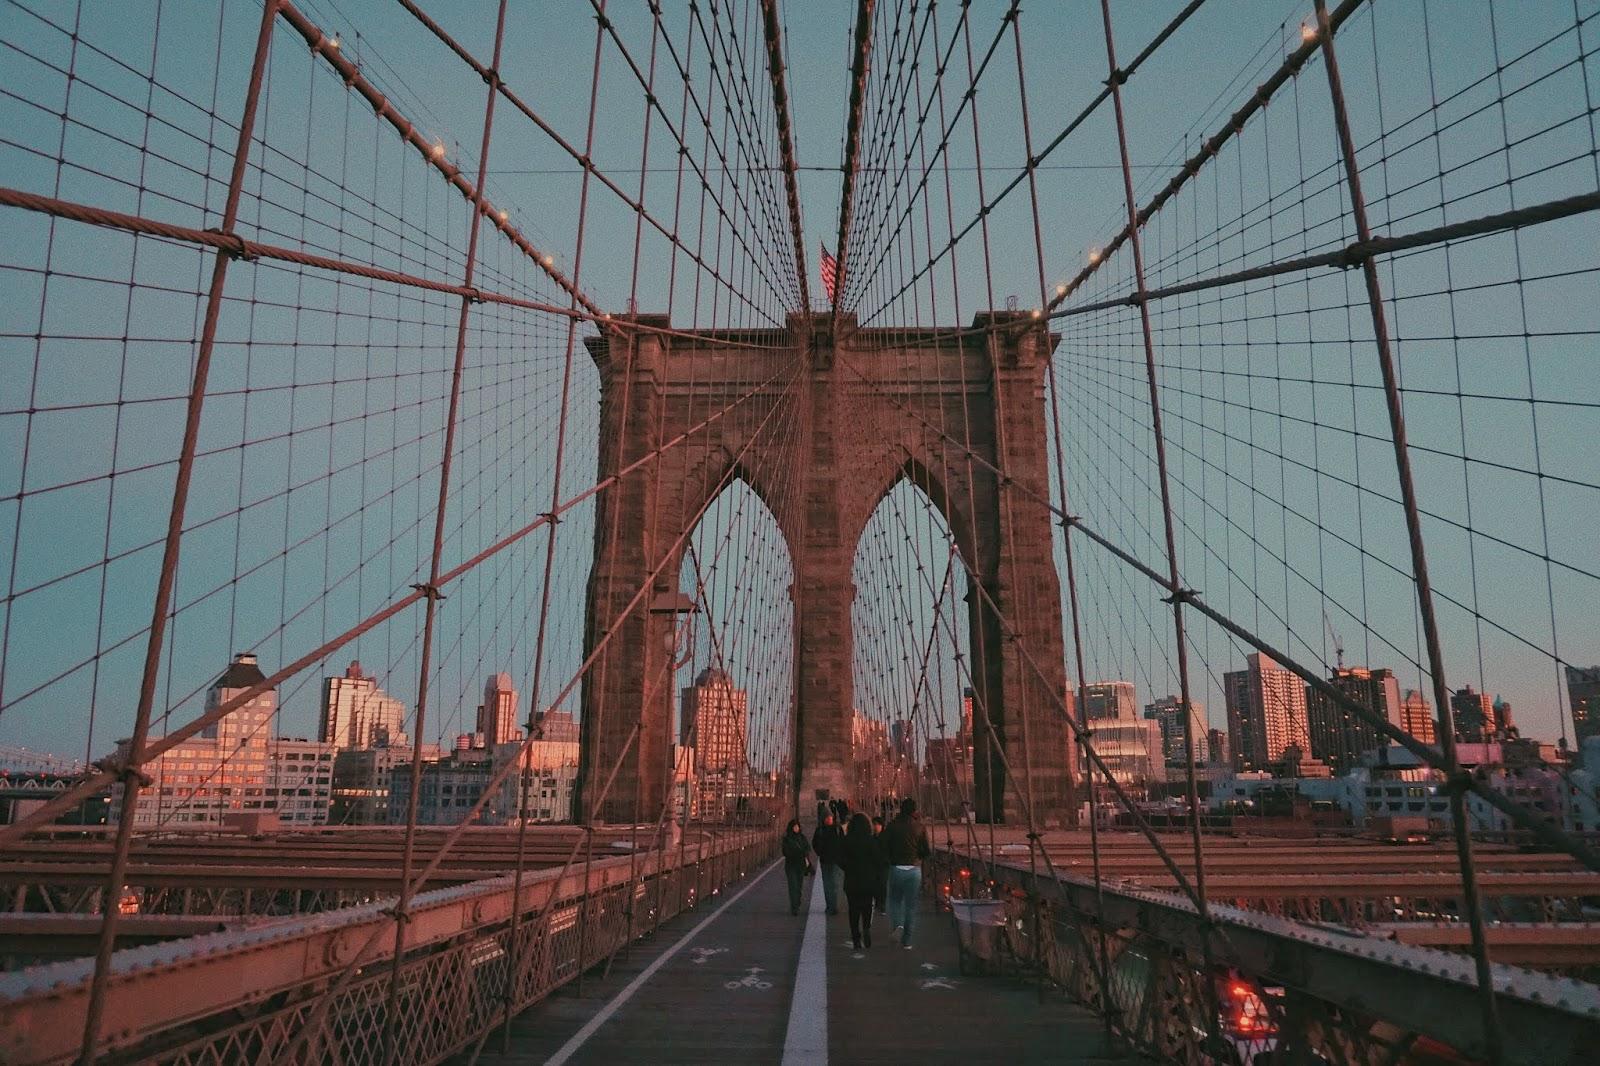 Best Instagram Spots in New York